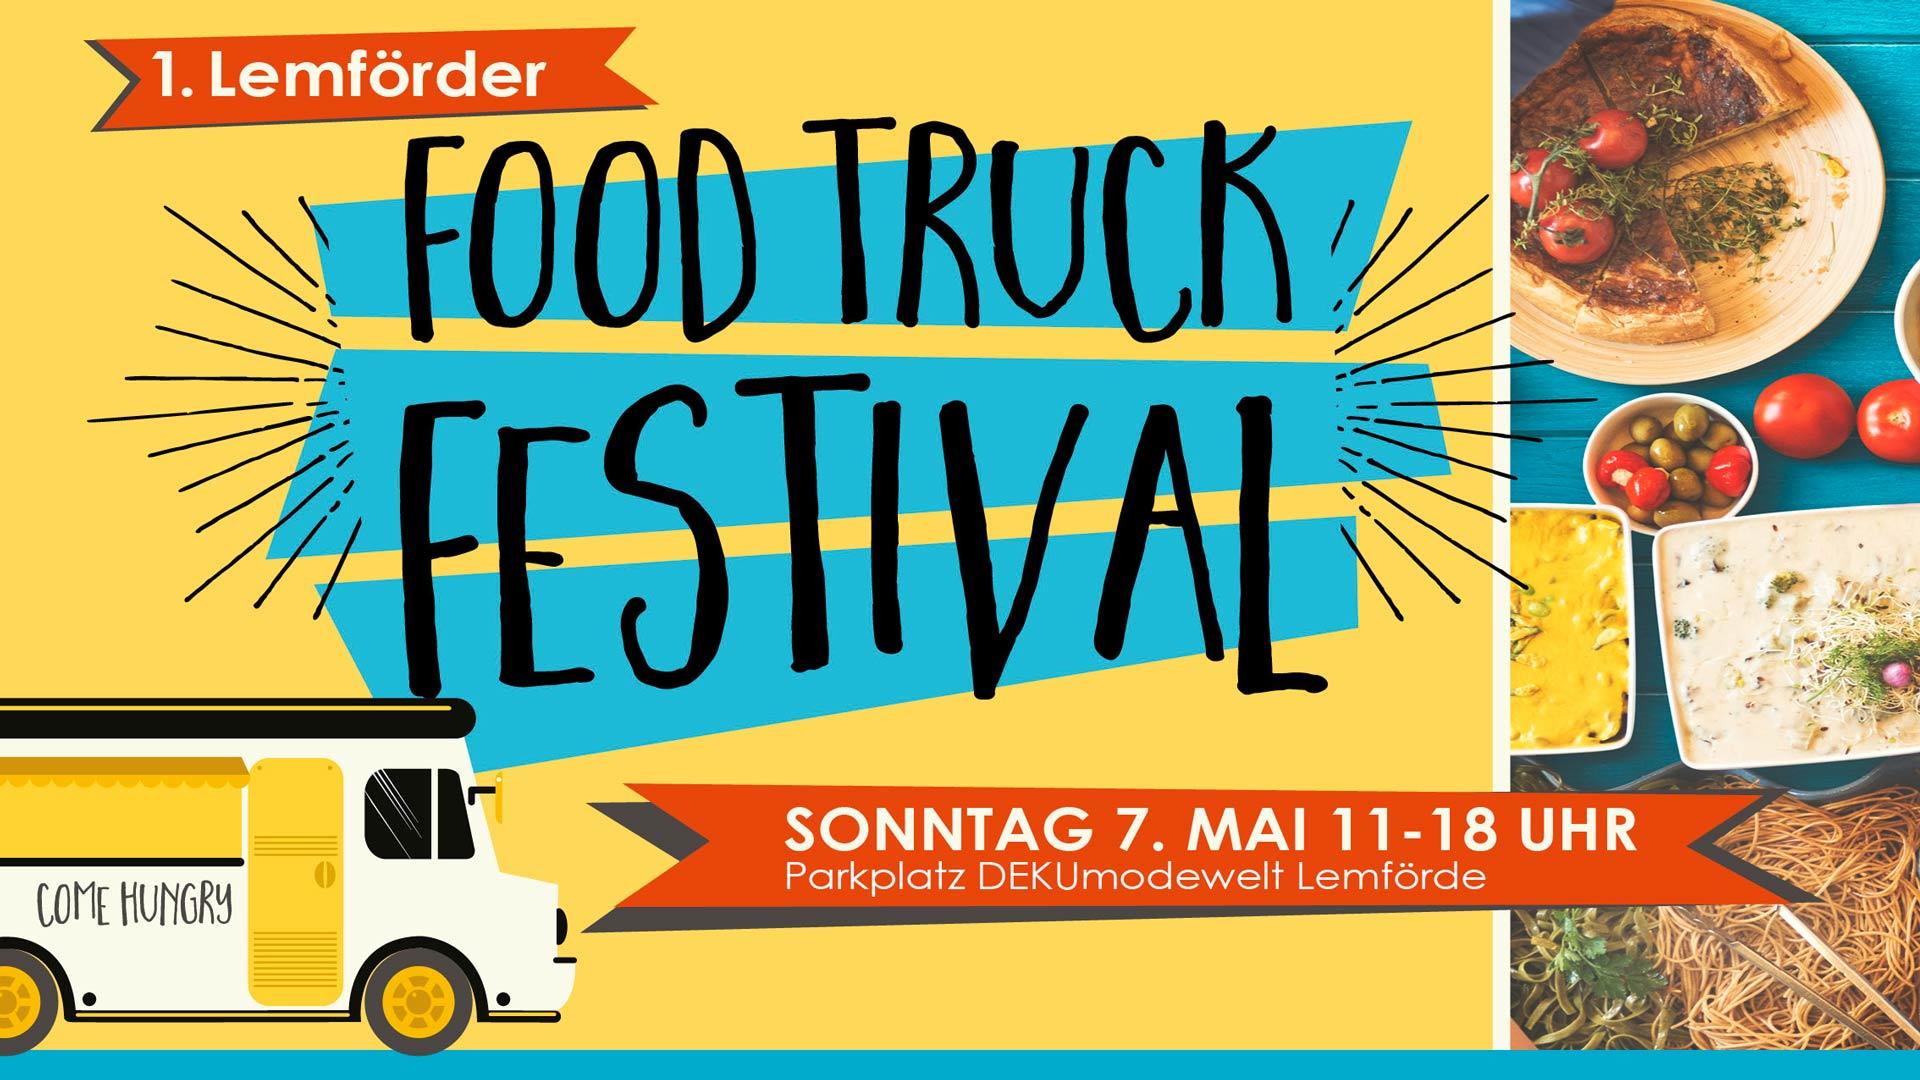 DEKU-foodtruck-festival